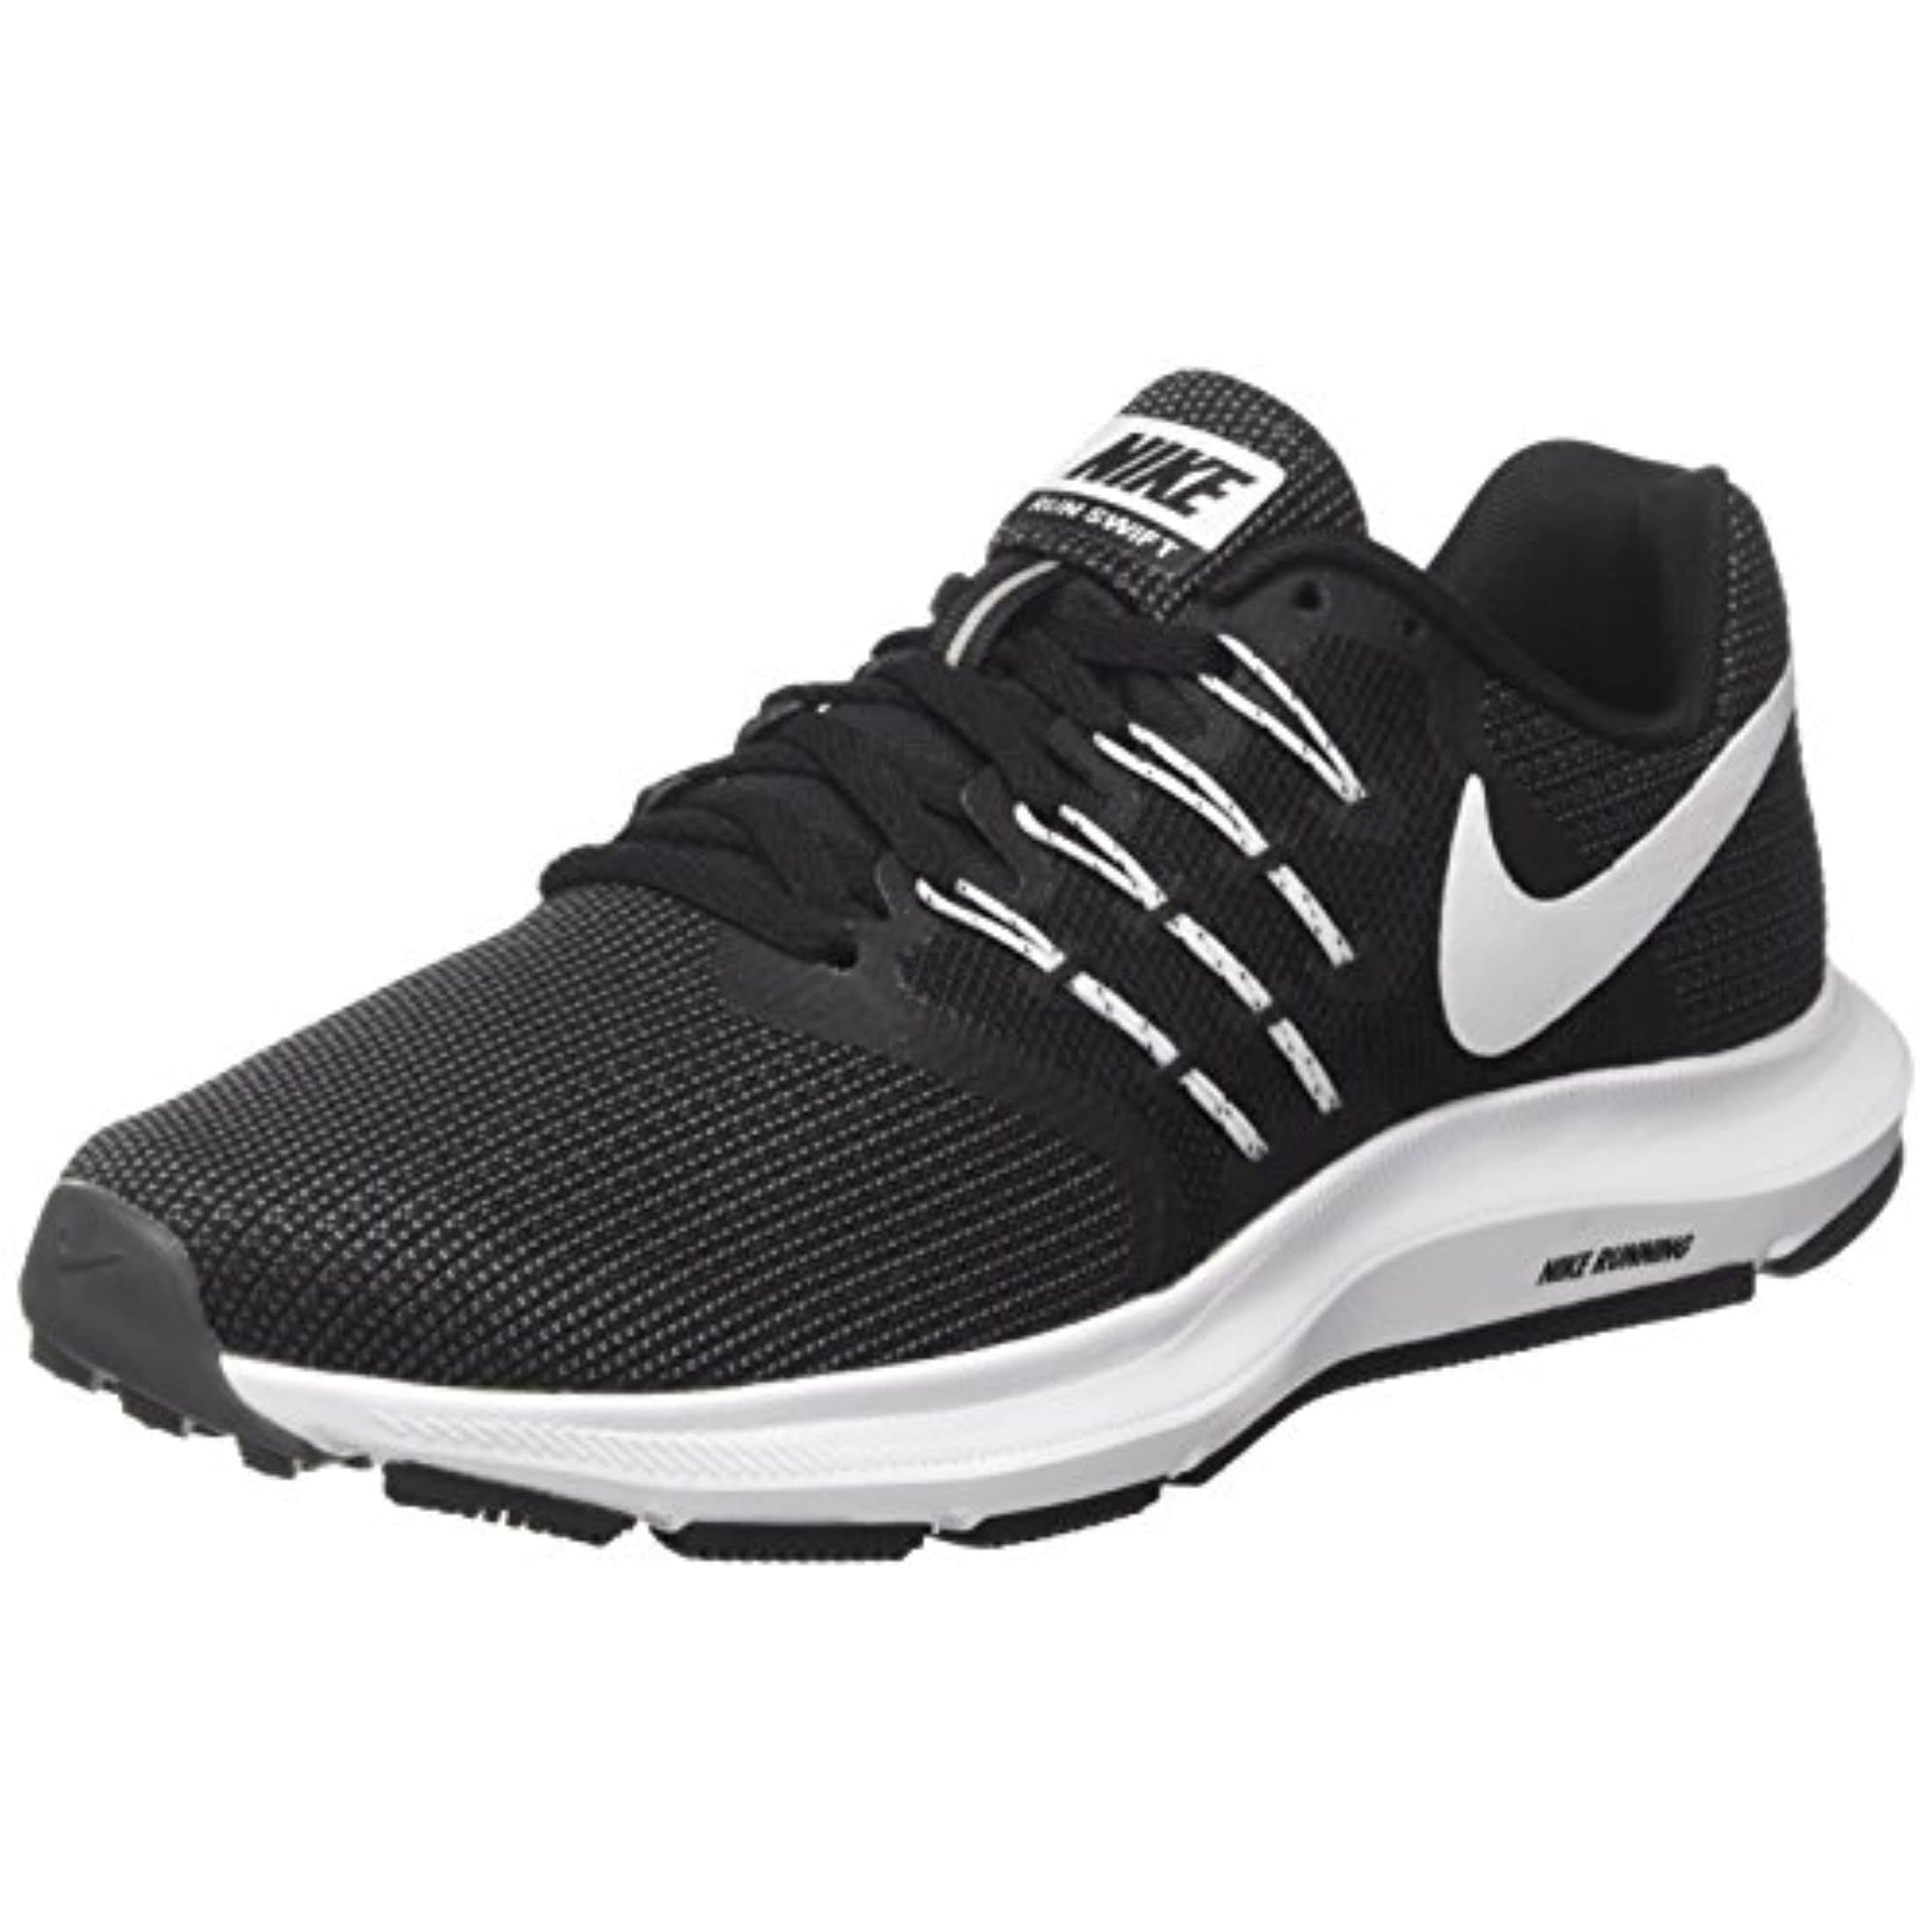 32ed10d568e Shop Nike Women s Run Swift Black White Dark Grey Running Shoes (8.5) -  Free Shipping Today - Overstock - 27359881